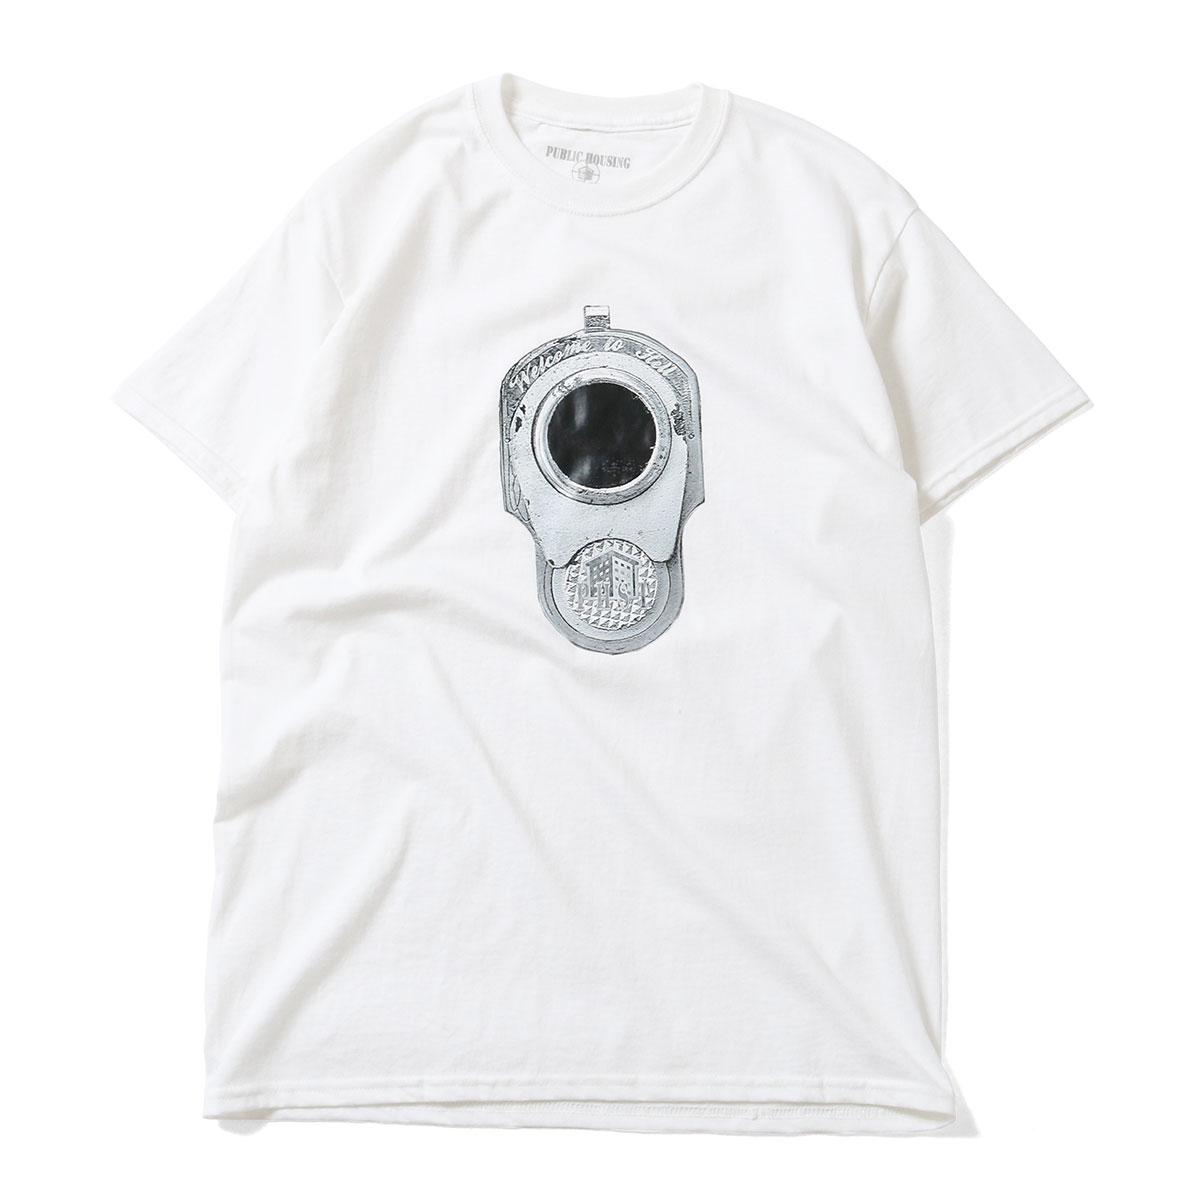 PUBLIC HOUSING SKATE TEAM パブリック ハウジング スケート チーム PHST GUN BARREL TEE 半袖 Tシャツ WHITE ホワイト